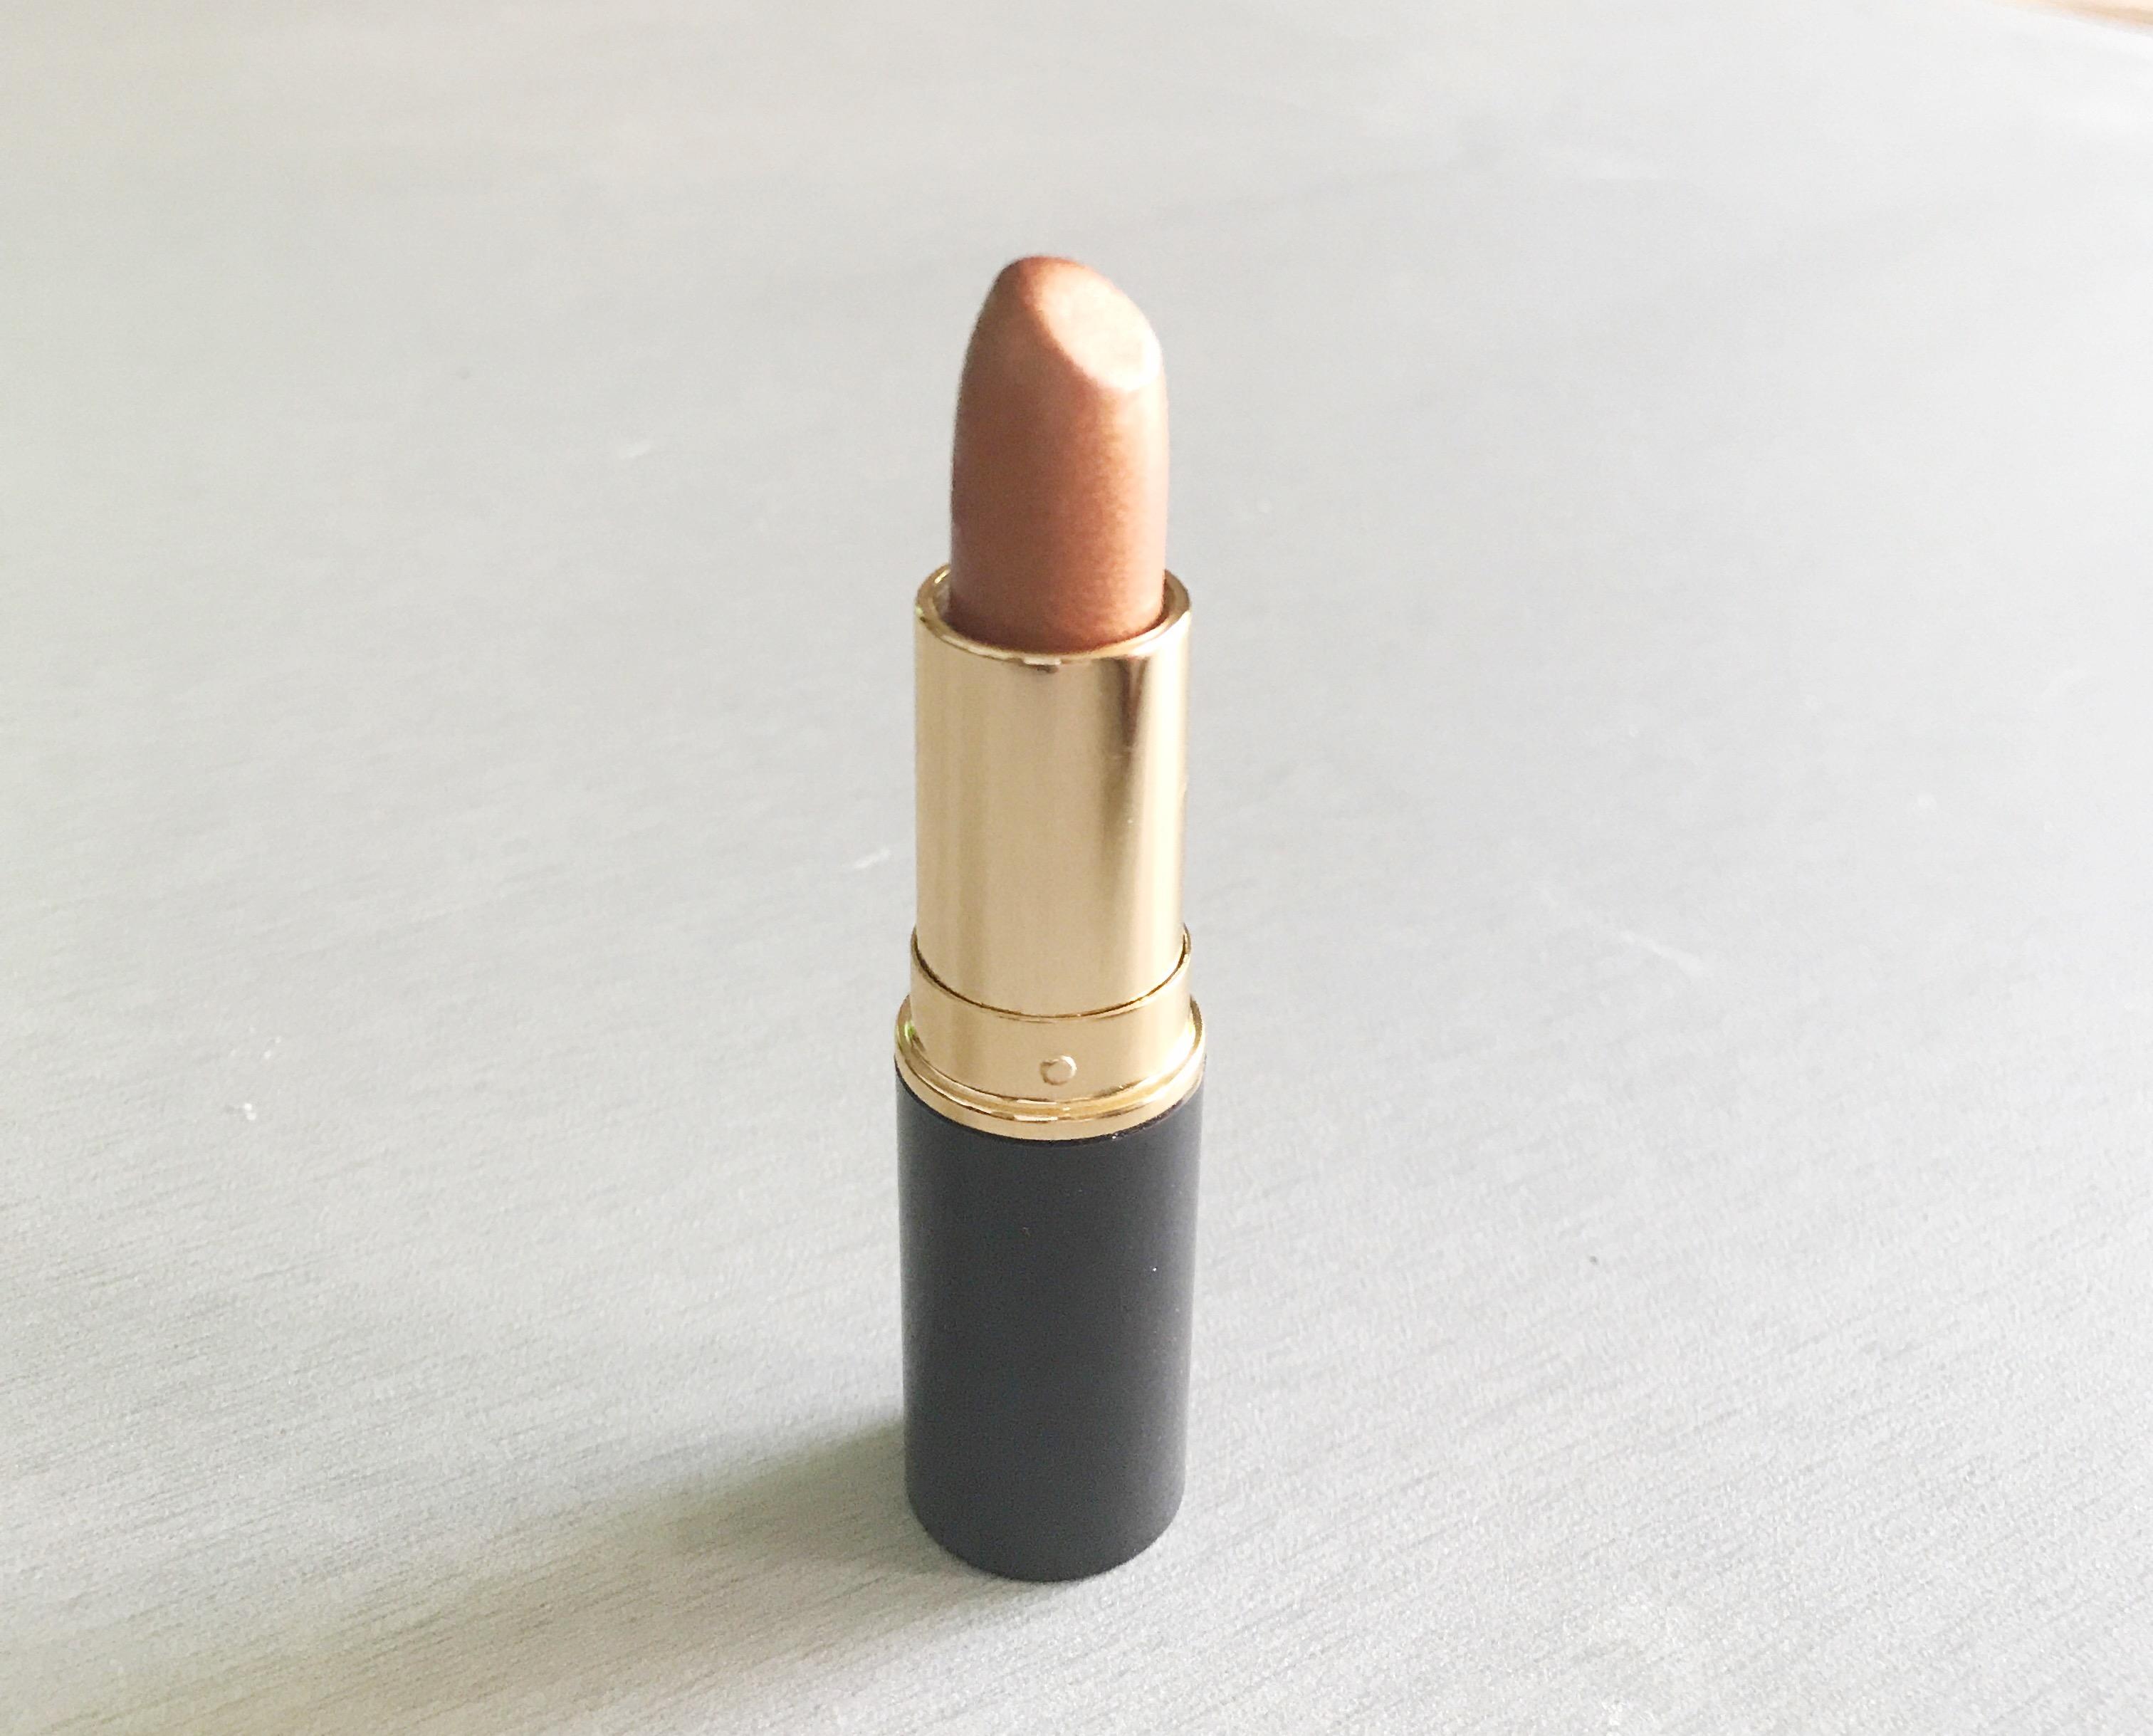 Iman Sheer Gold Lipstick